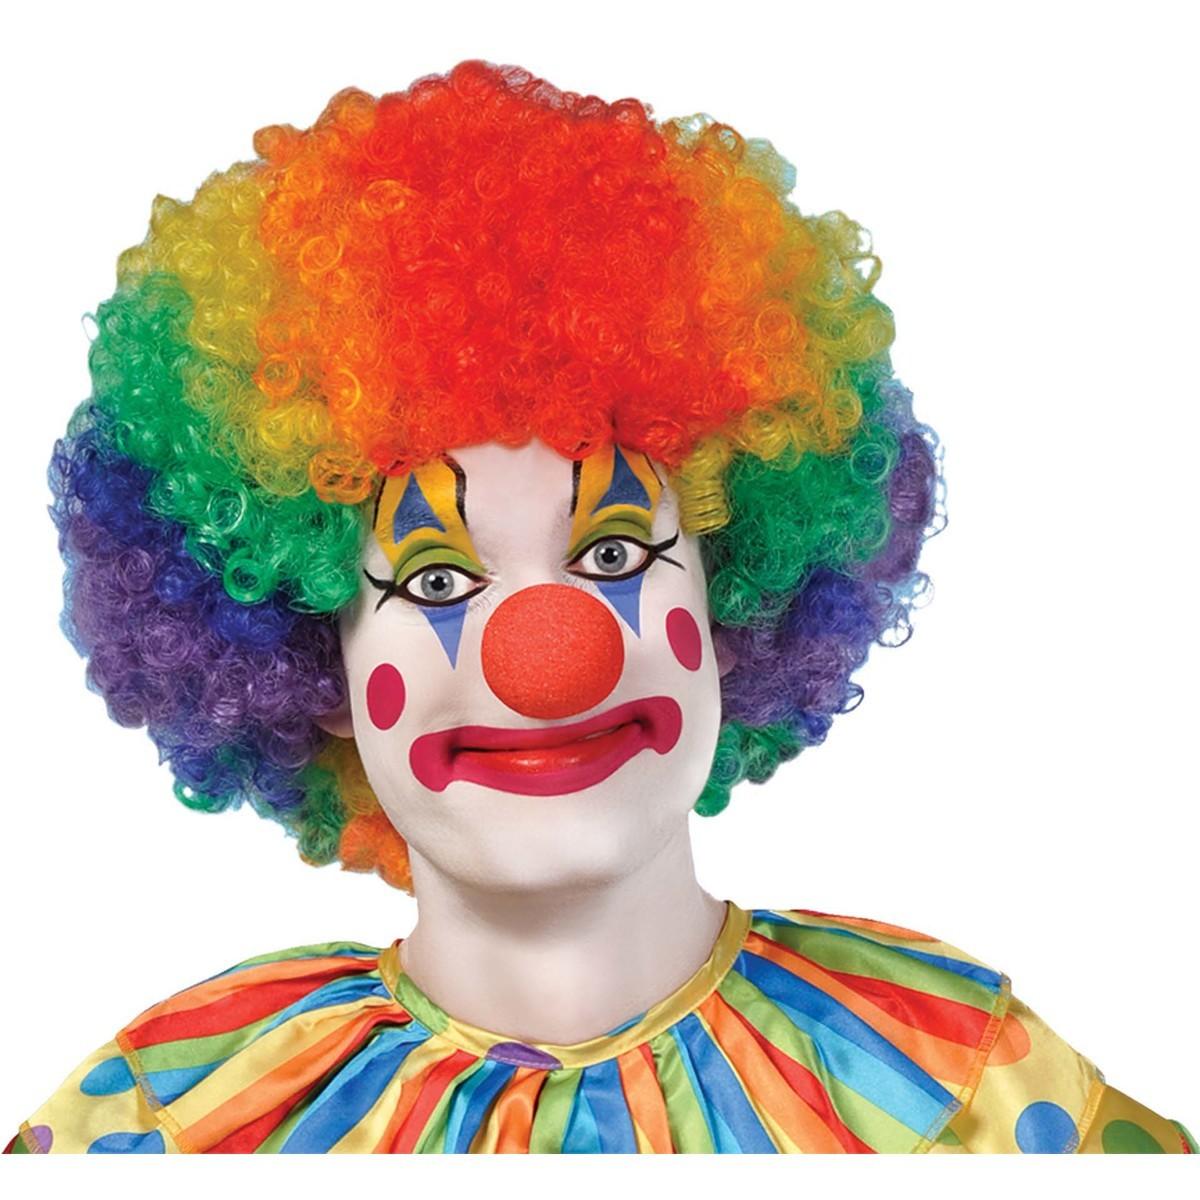 Jumbo S Clown Room